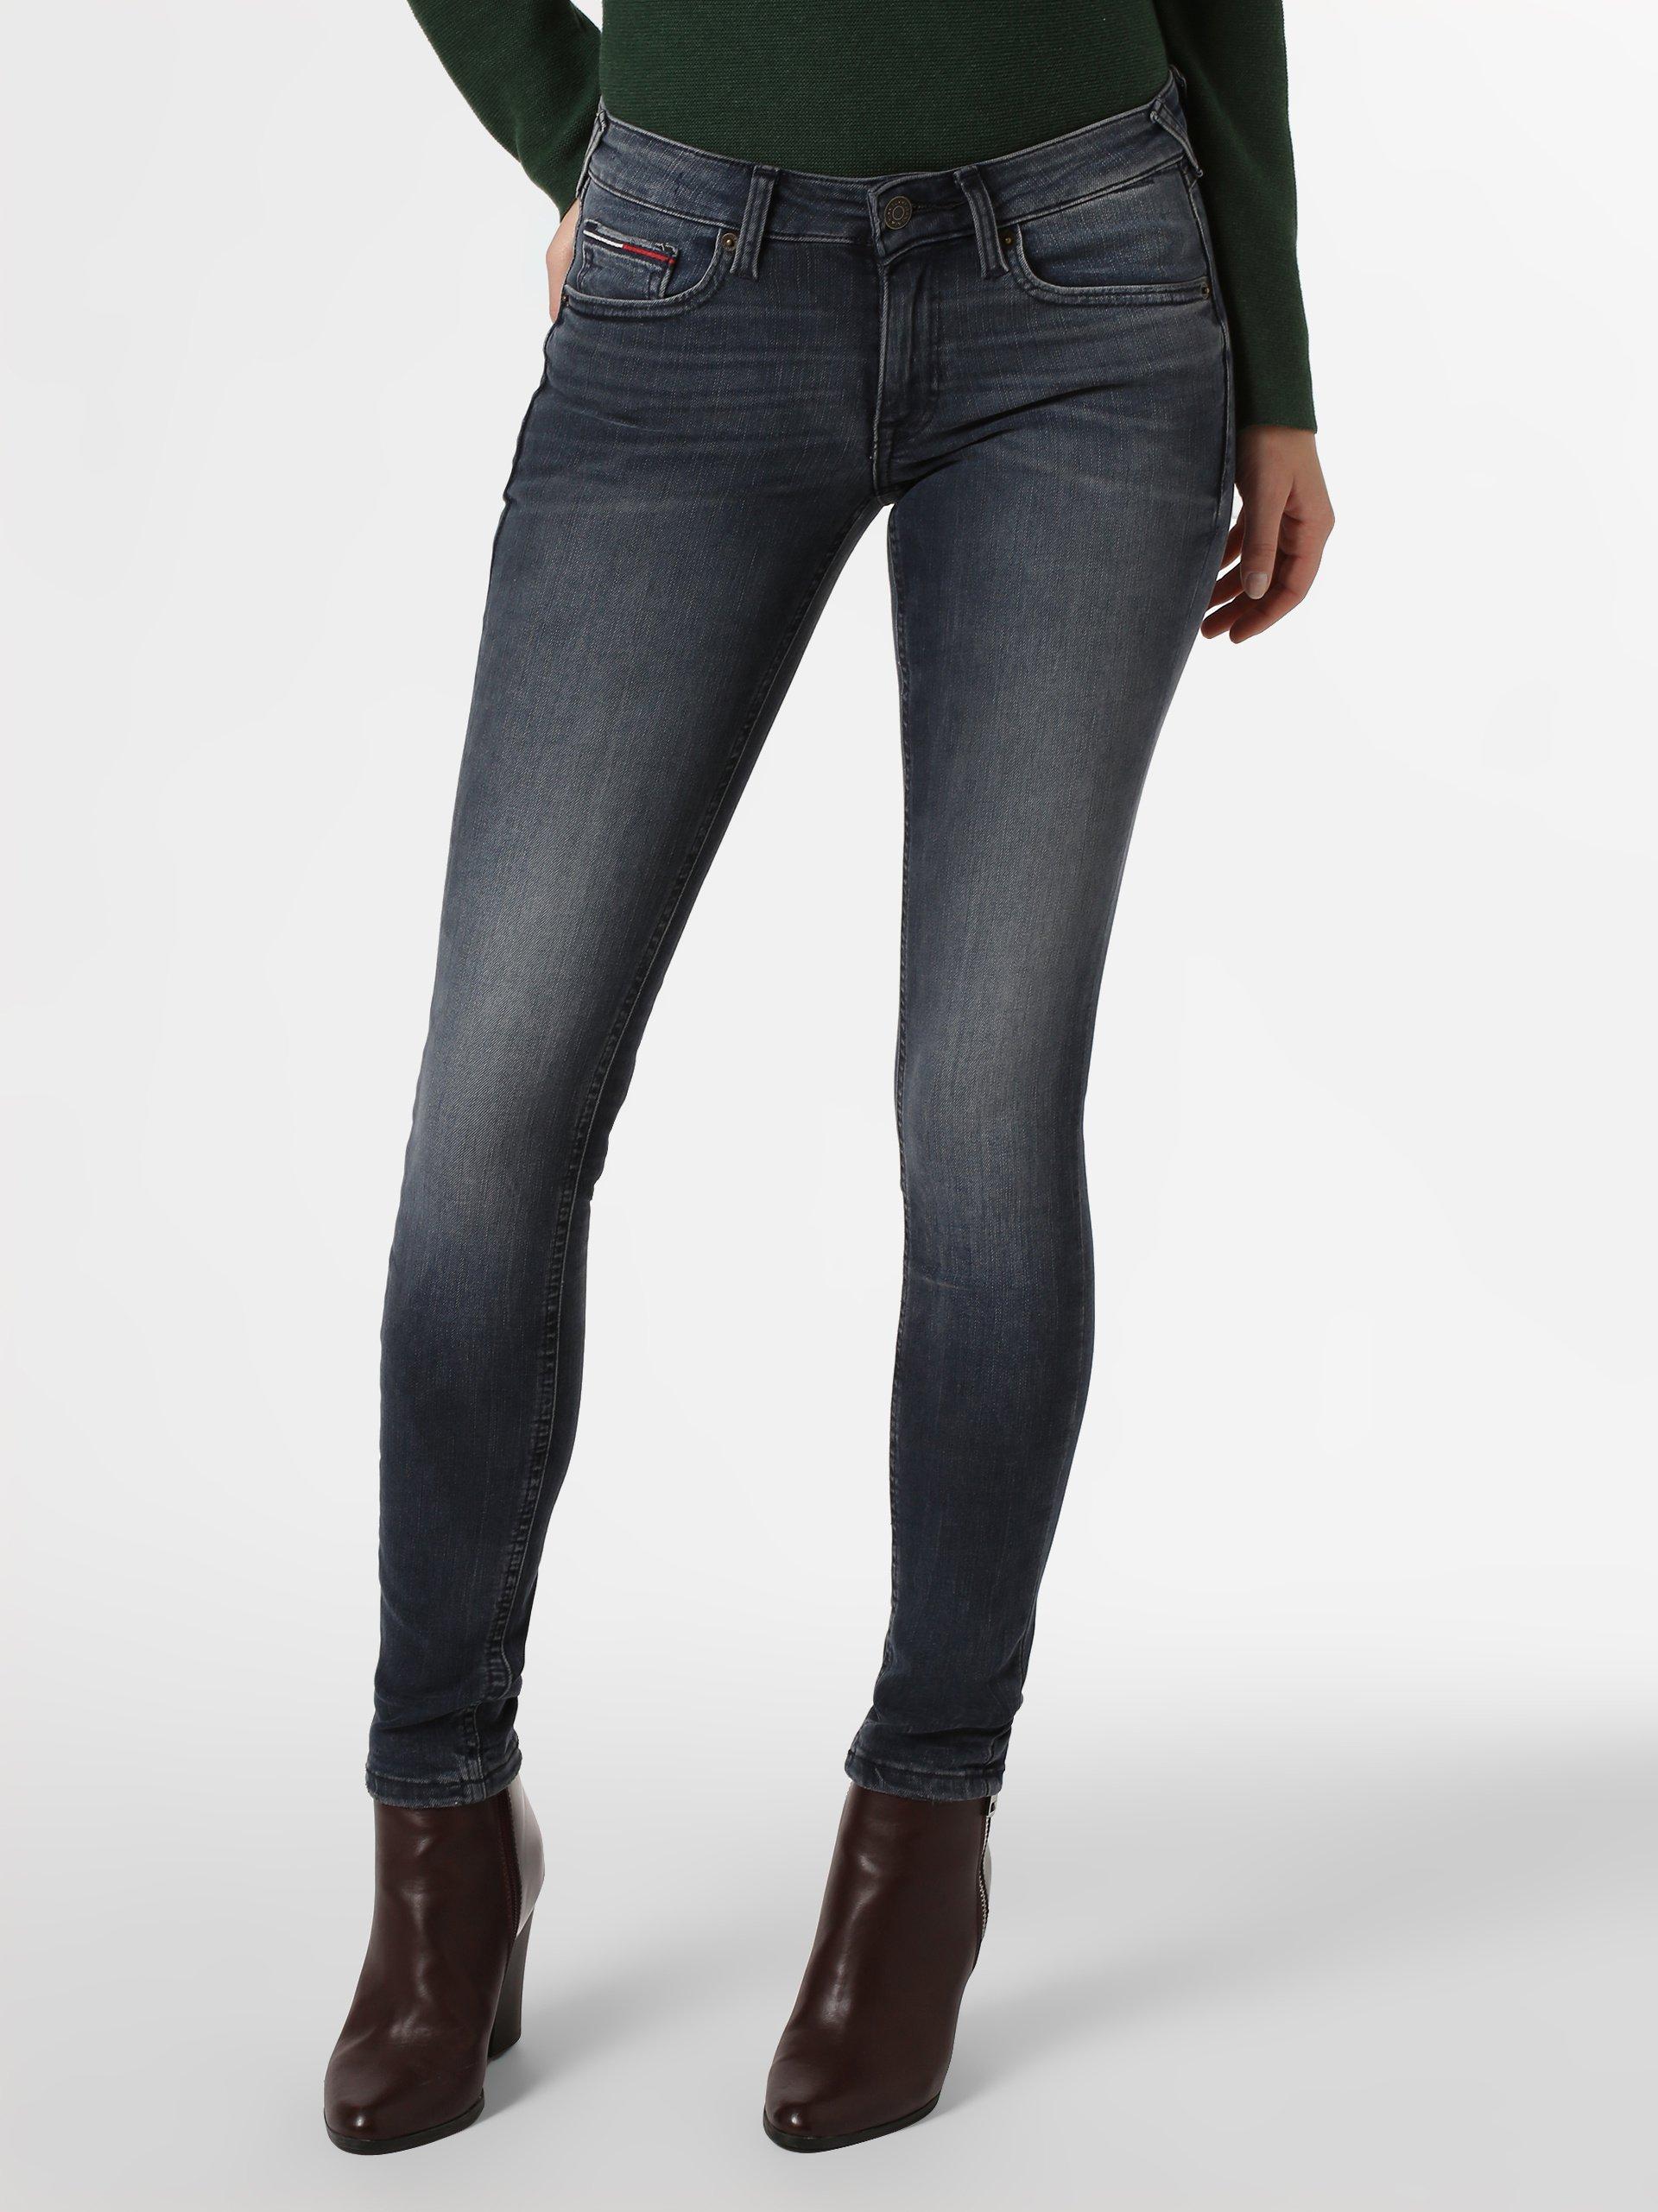 Tommy Jeans Damen Jeans - Sophie